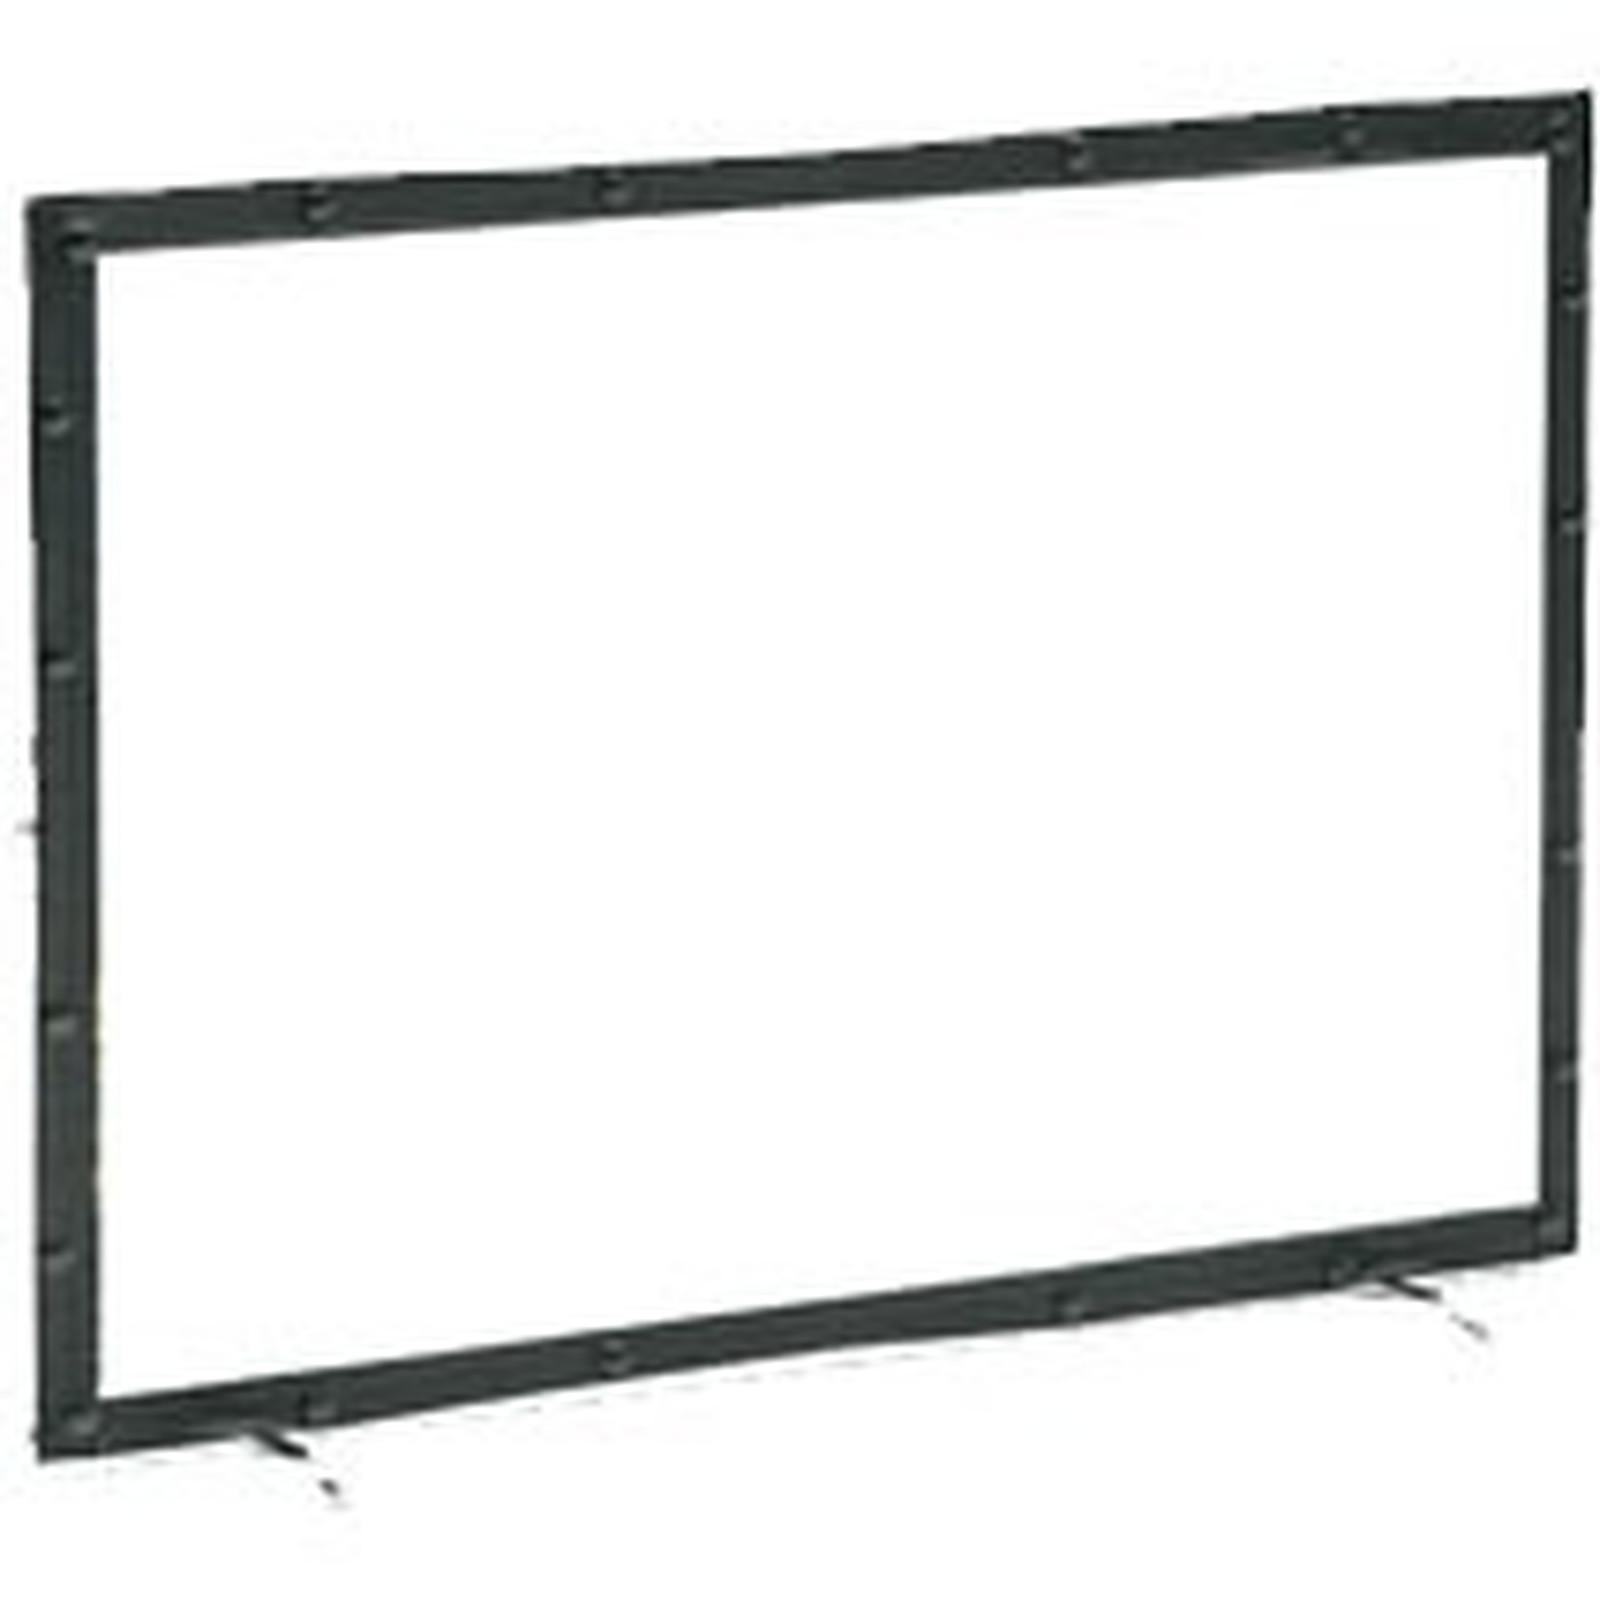 Procolor MINI-FOLD - Ecran de table - Format 16:9 - 76x53 cm